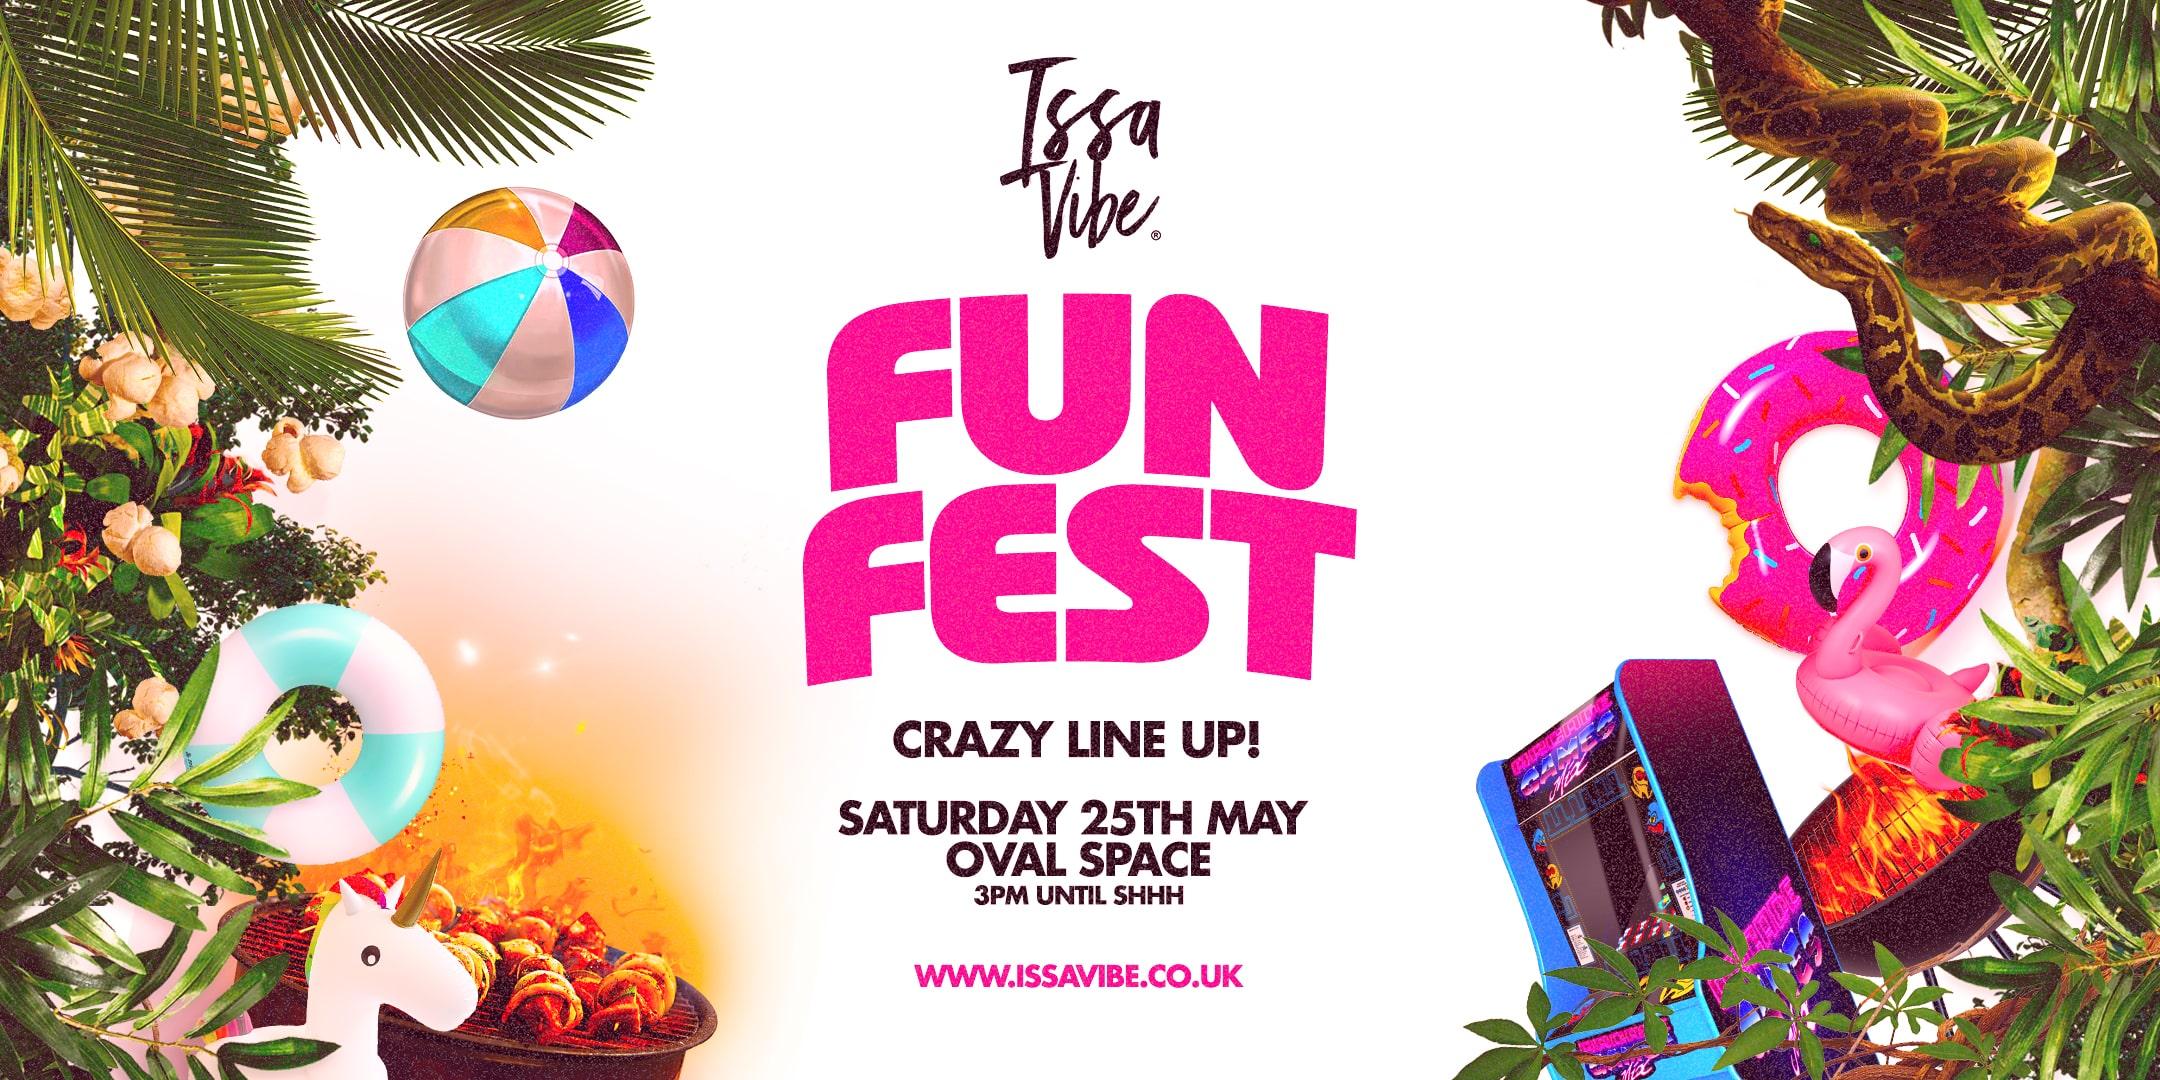 Issa Vibe Fun Fest